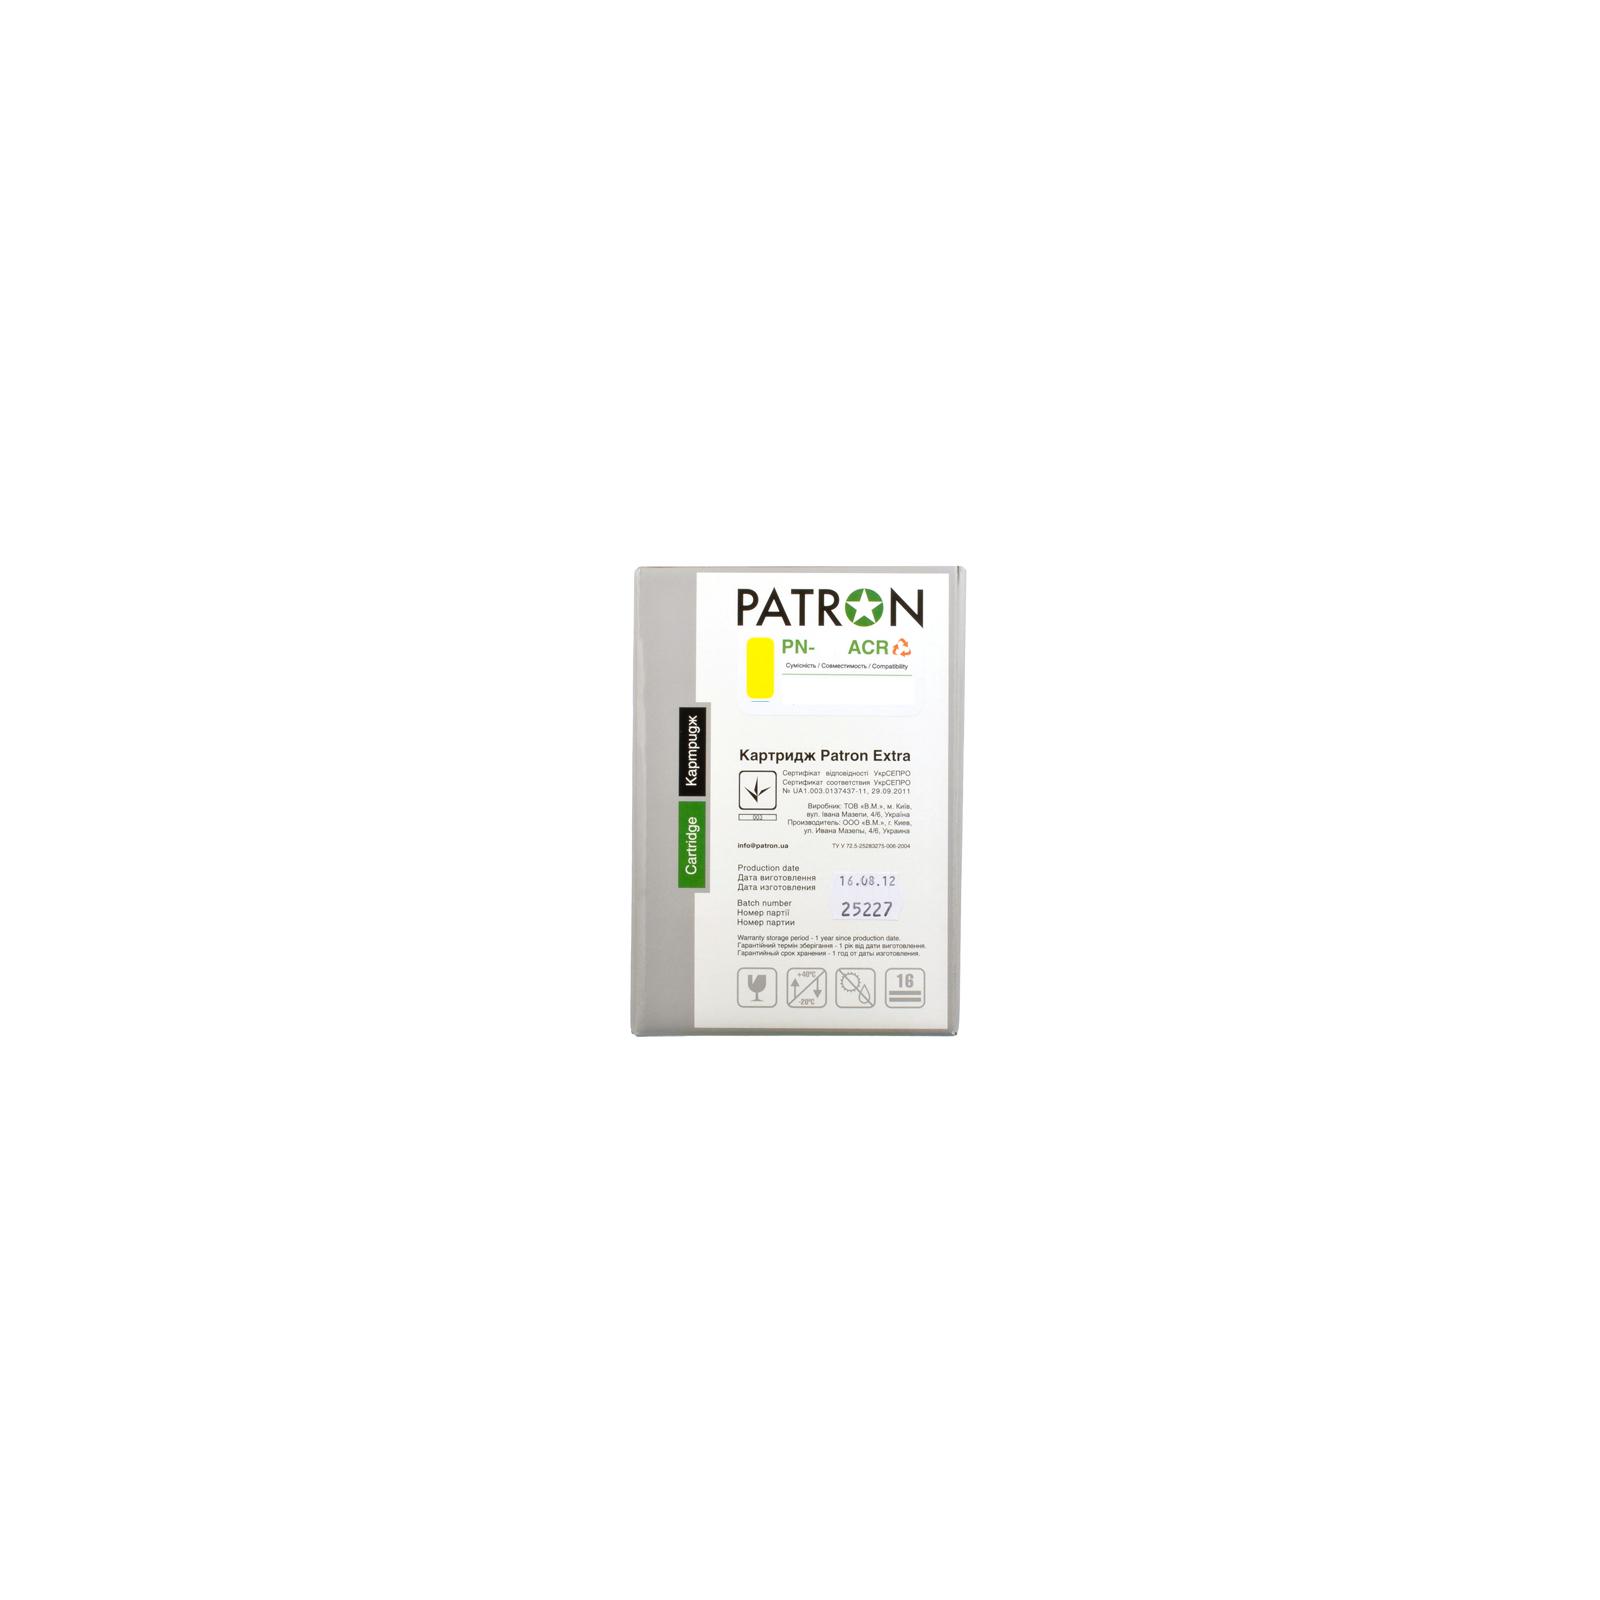 Картридж PATRON HP CLJ 5500/ 5550 YELLOW /PN-645AYR (CT-HP-C9732A-Y-PN-R) изображение 5